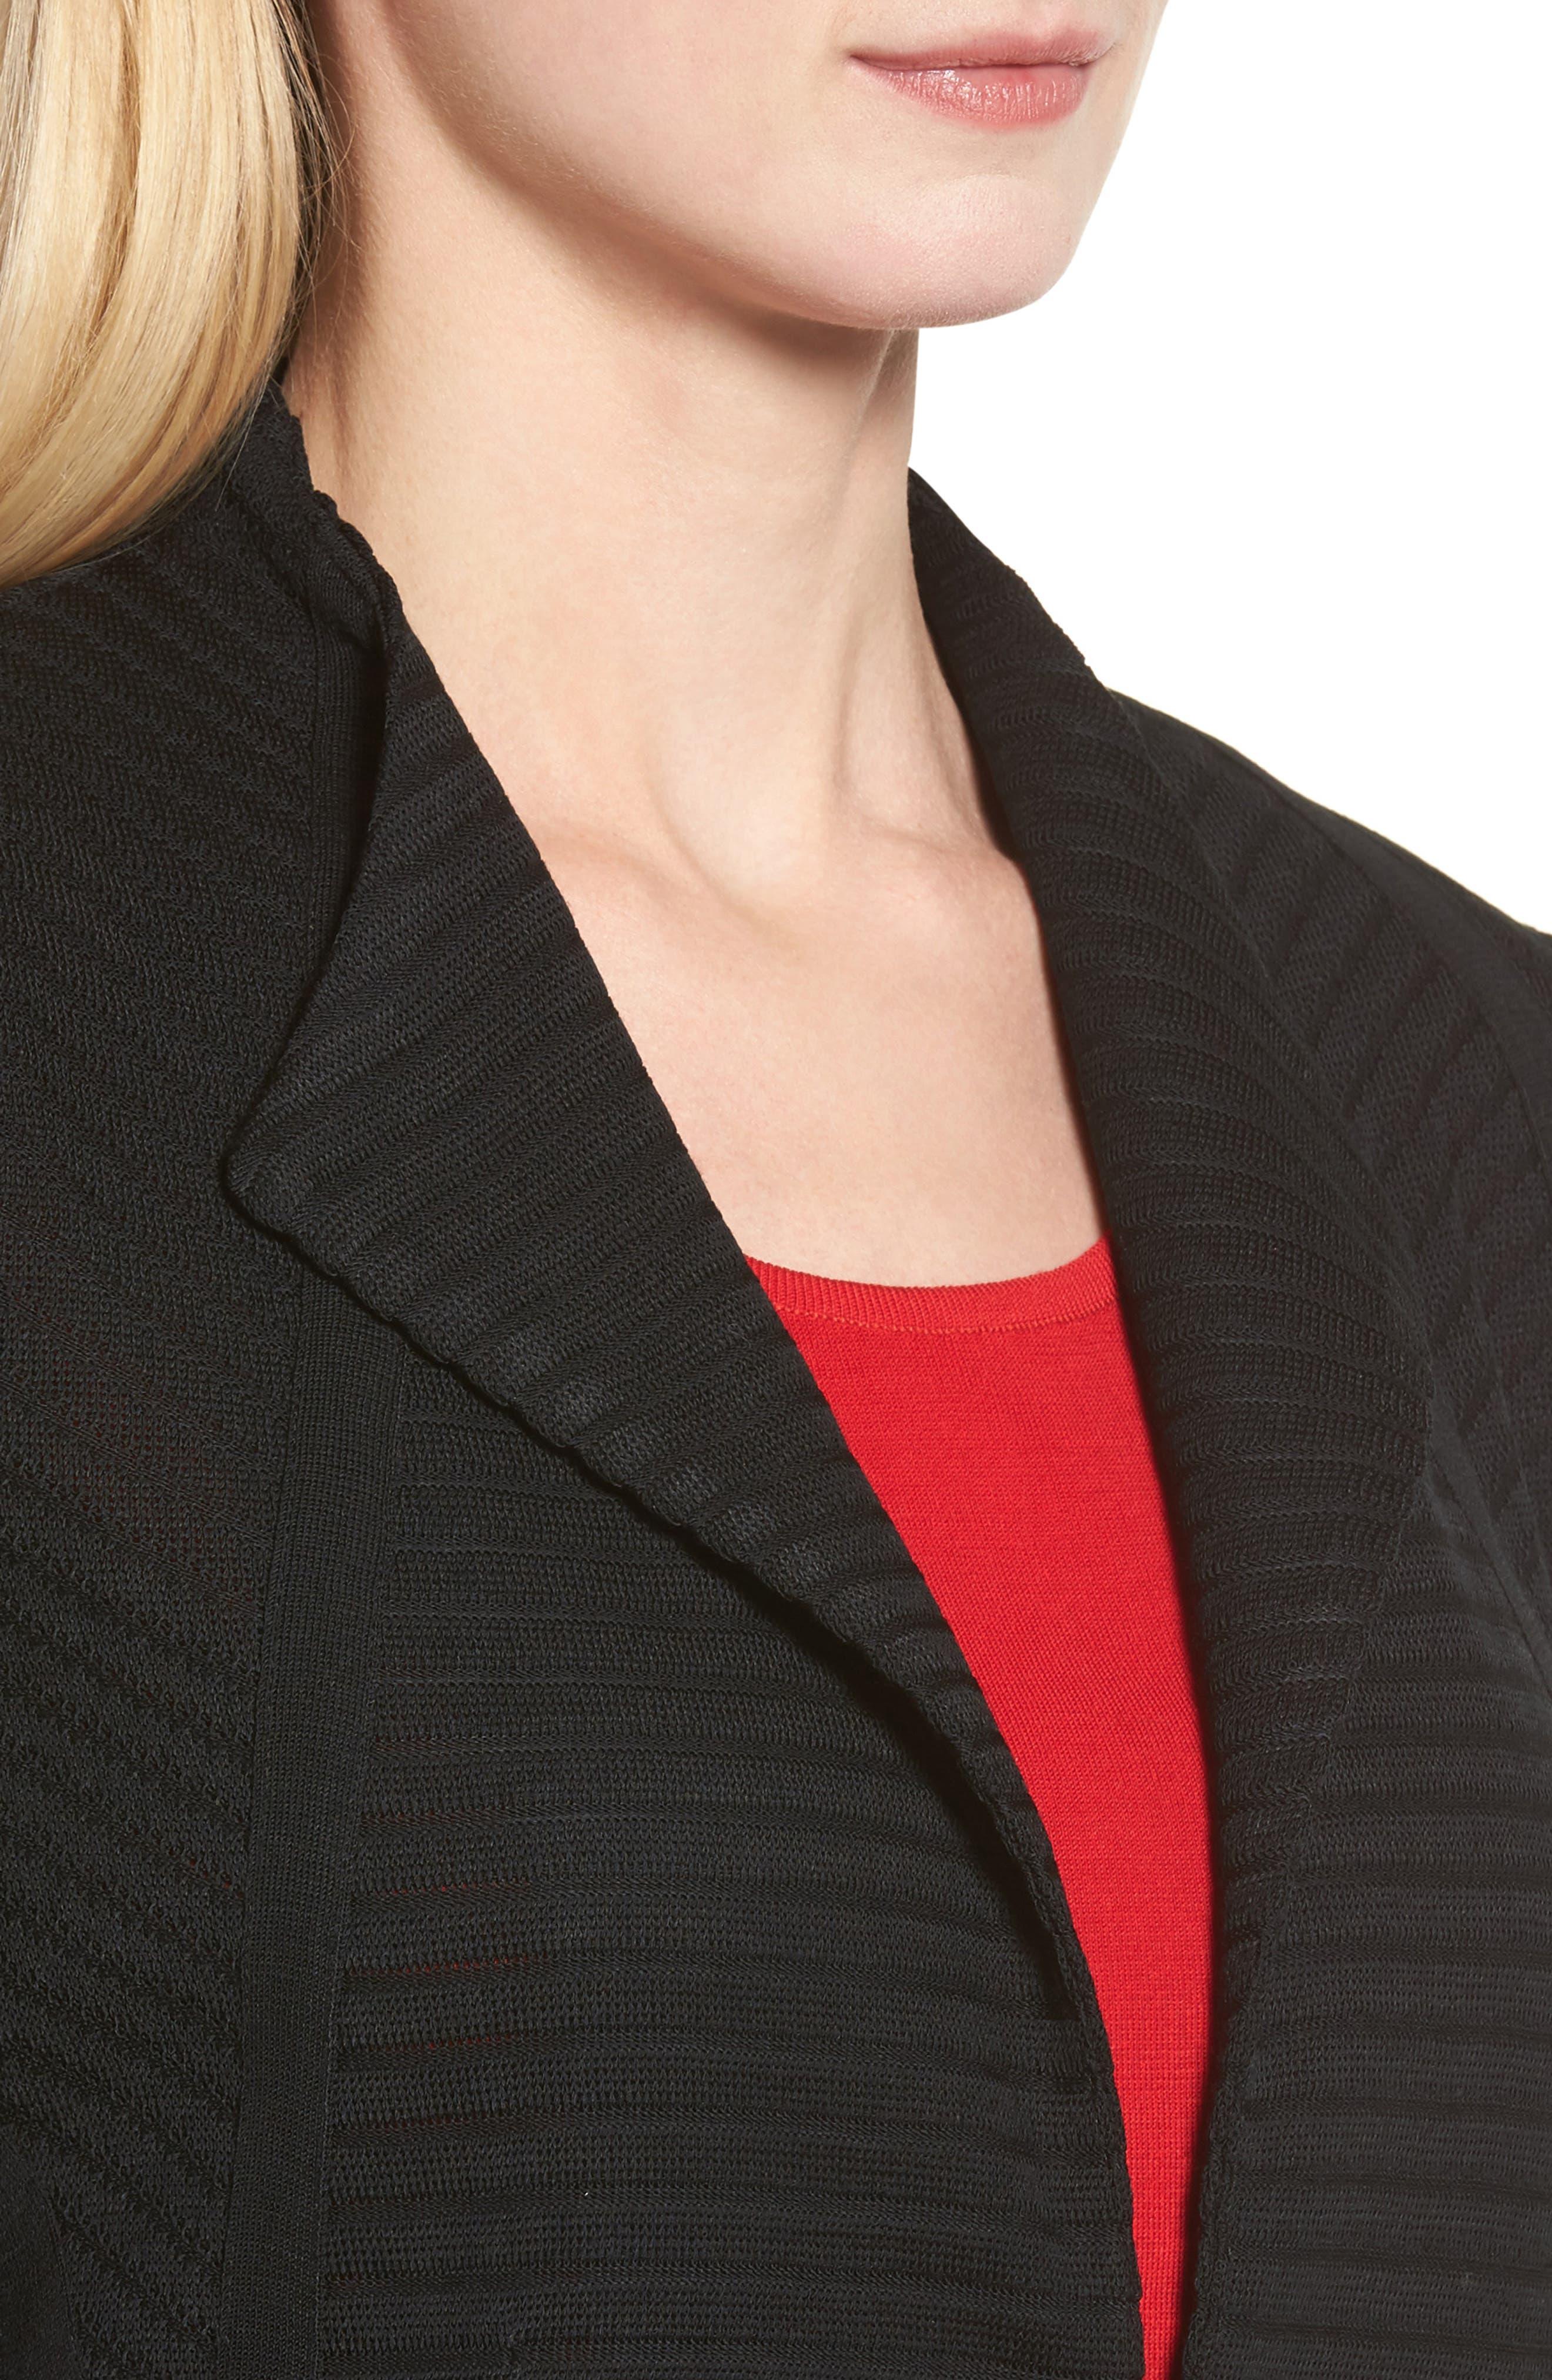 Striped Knit Jacket,                             Alternate thumbnail 4, color,                             Black